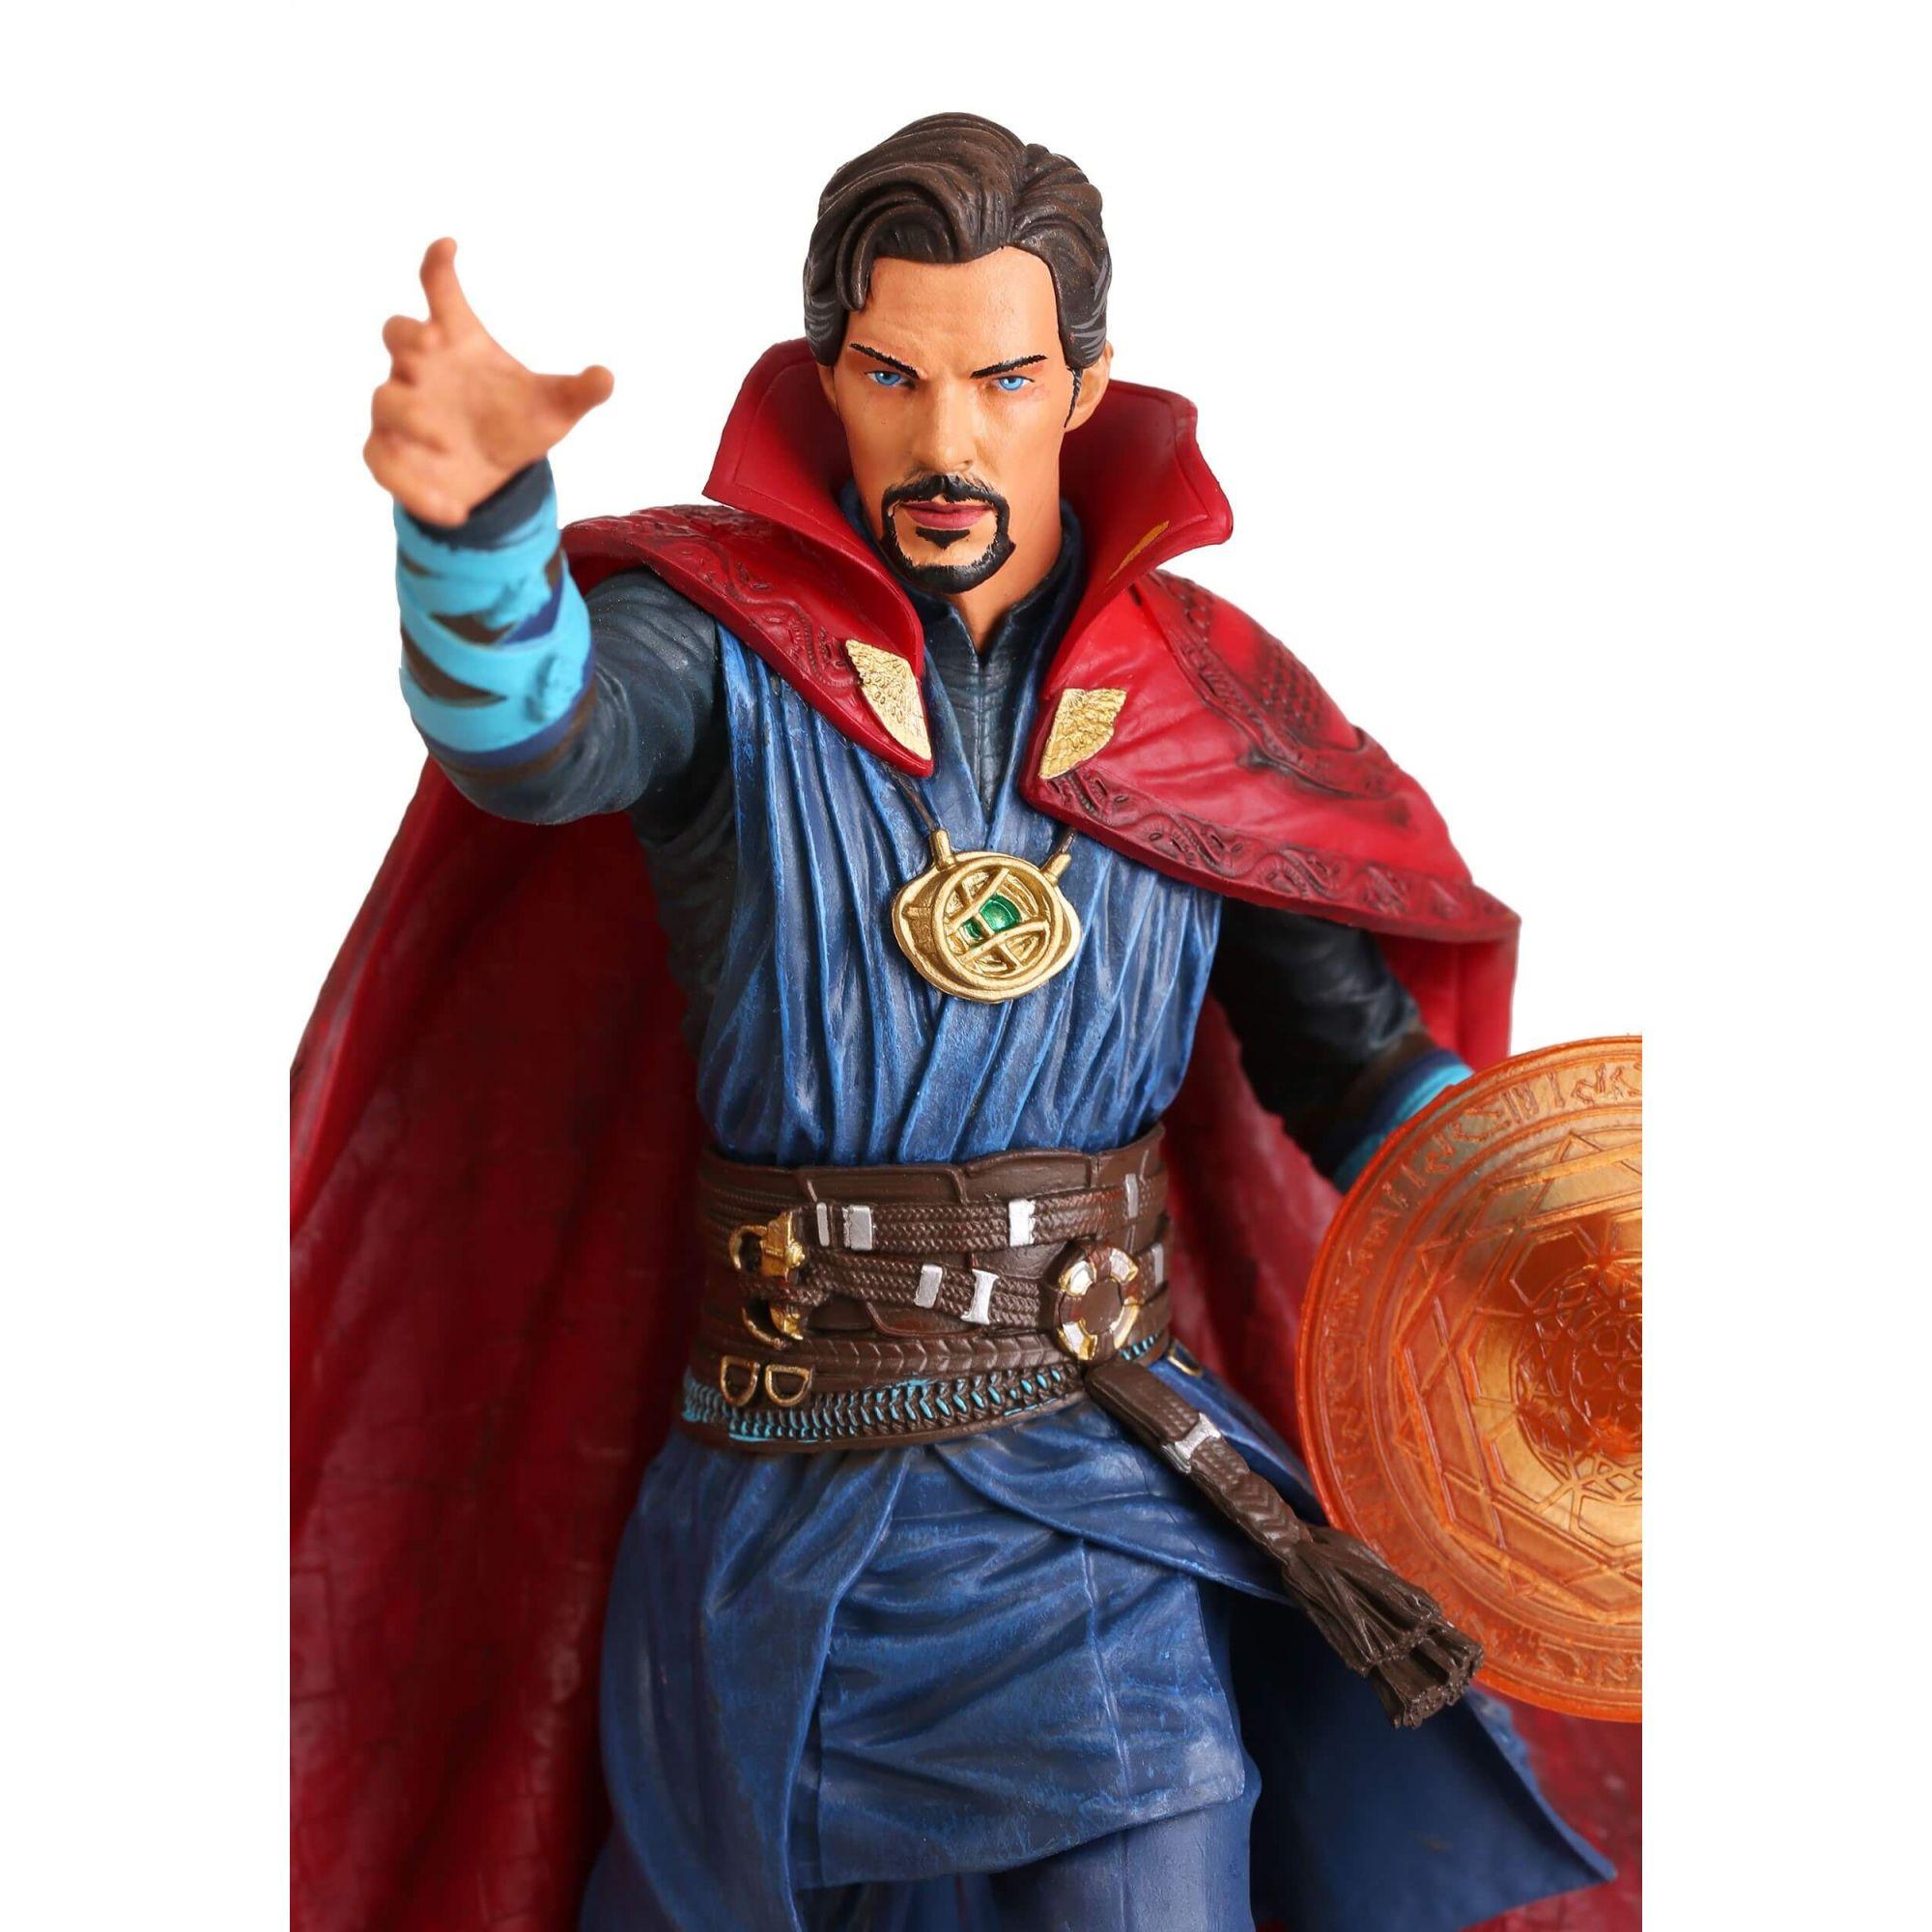 Doctor Strange (Doutor Estranho) - Avengers Infinity War (Vingadores Guerra Infinita) - Marvel Gallery - Diamond Select Toys